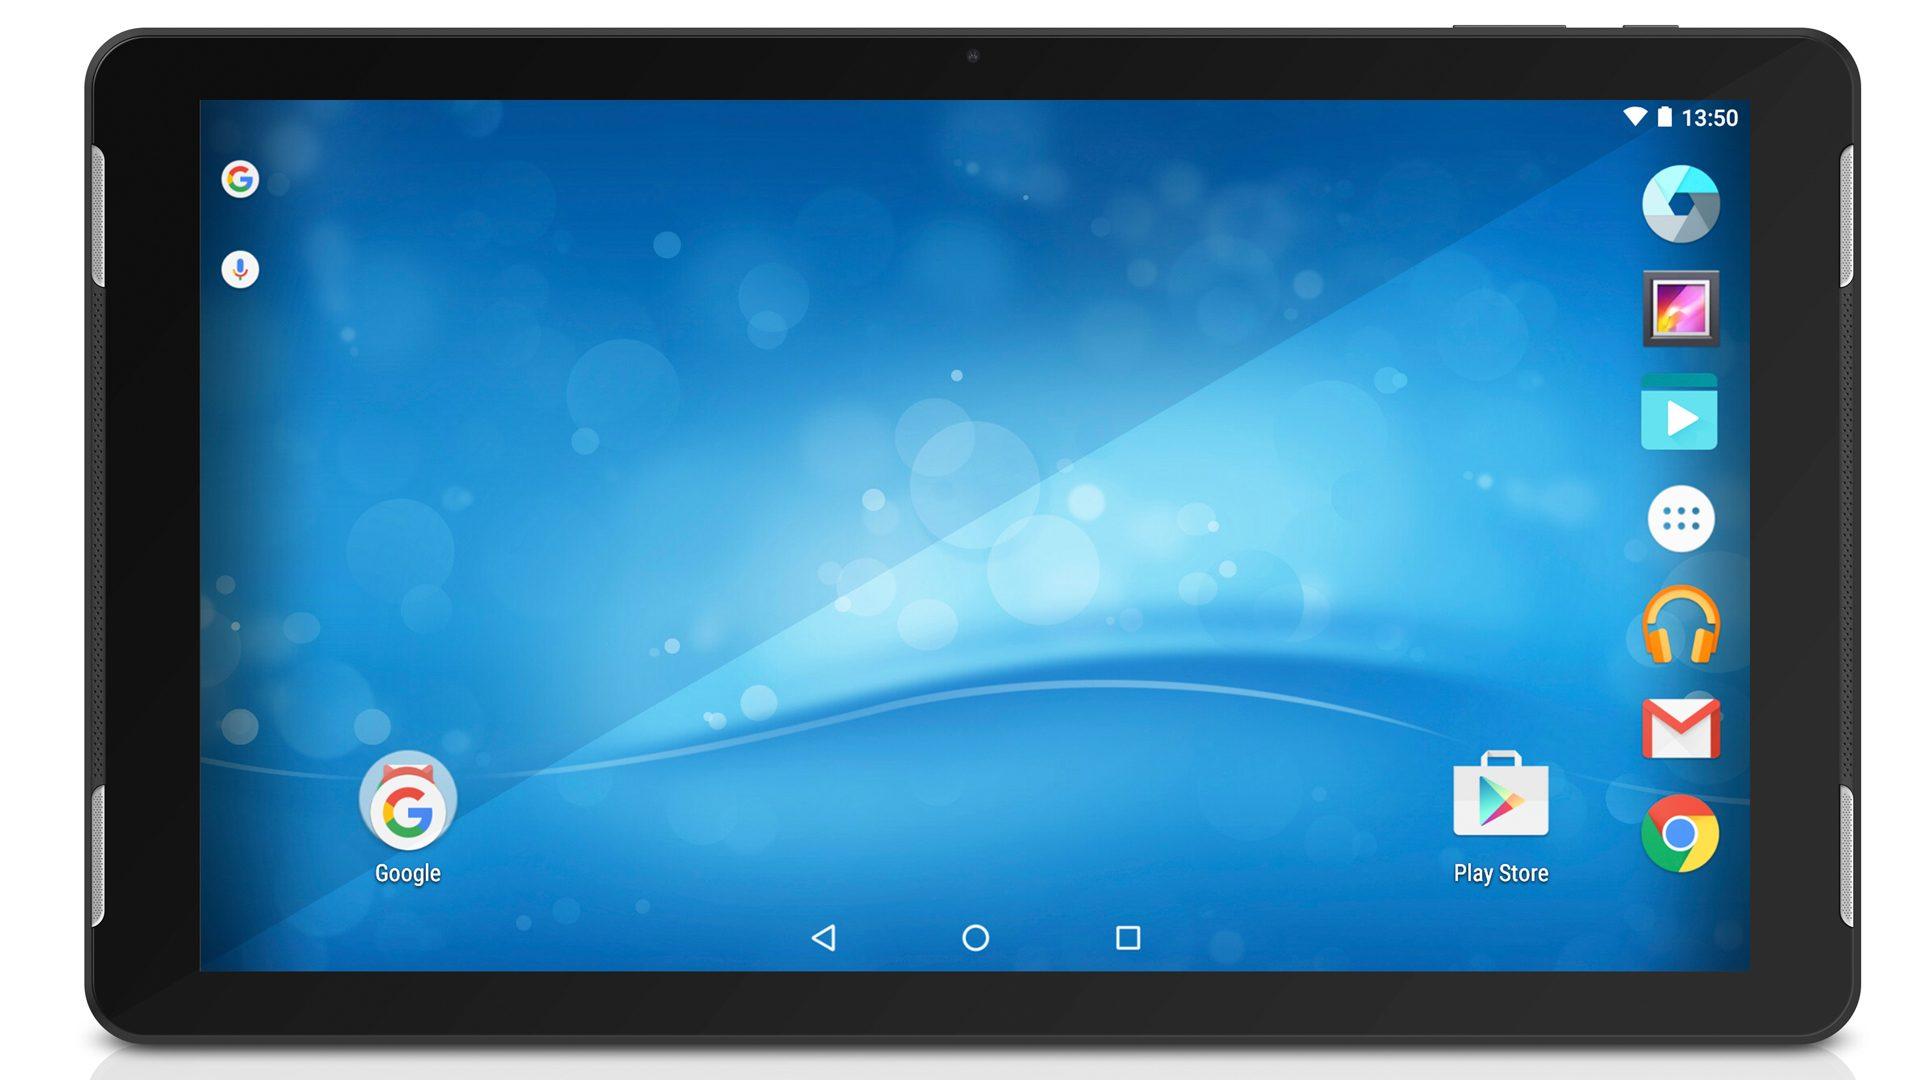 gro es tablet von trekstor mit android 6 im test. Black Bedroom Furniture Sets. Home Design Ideas